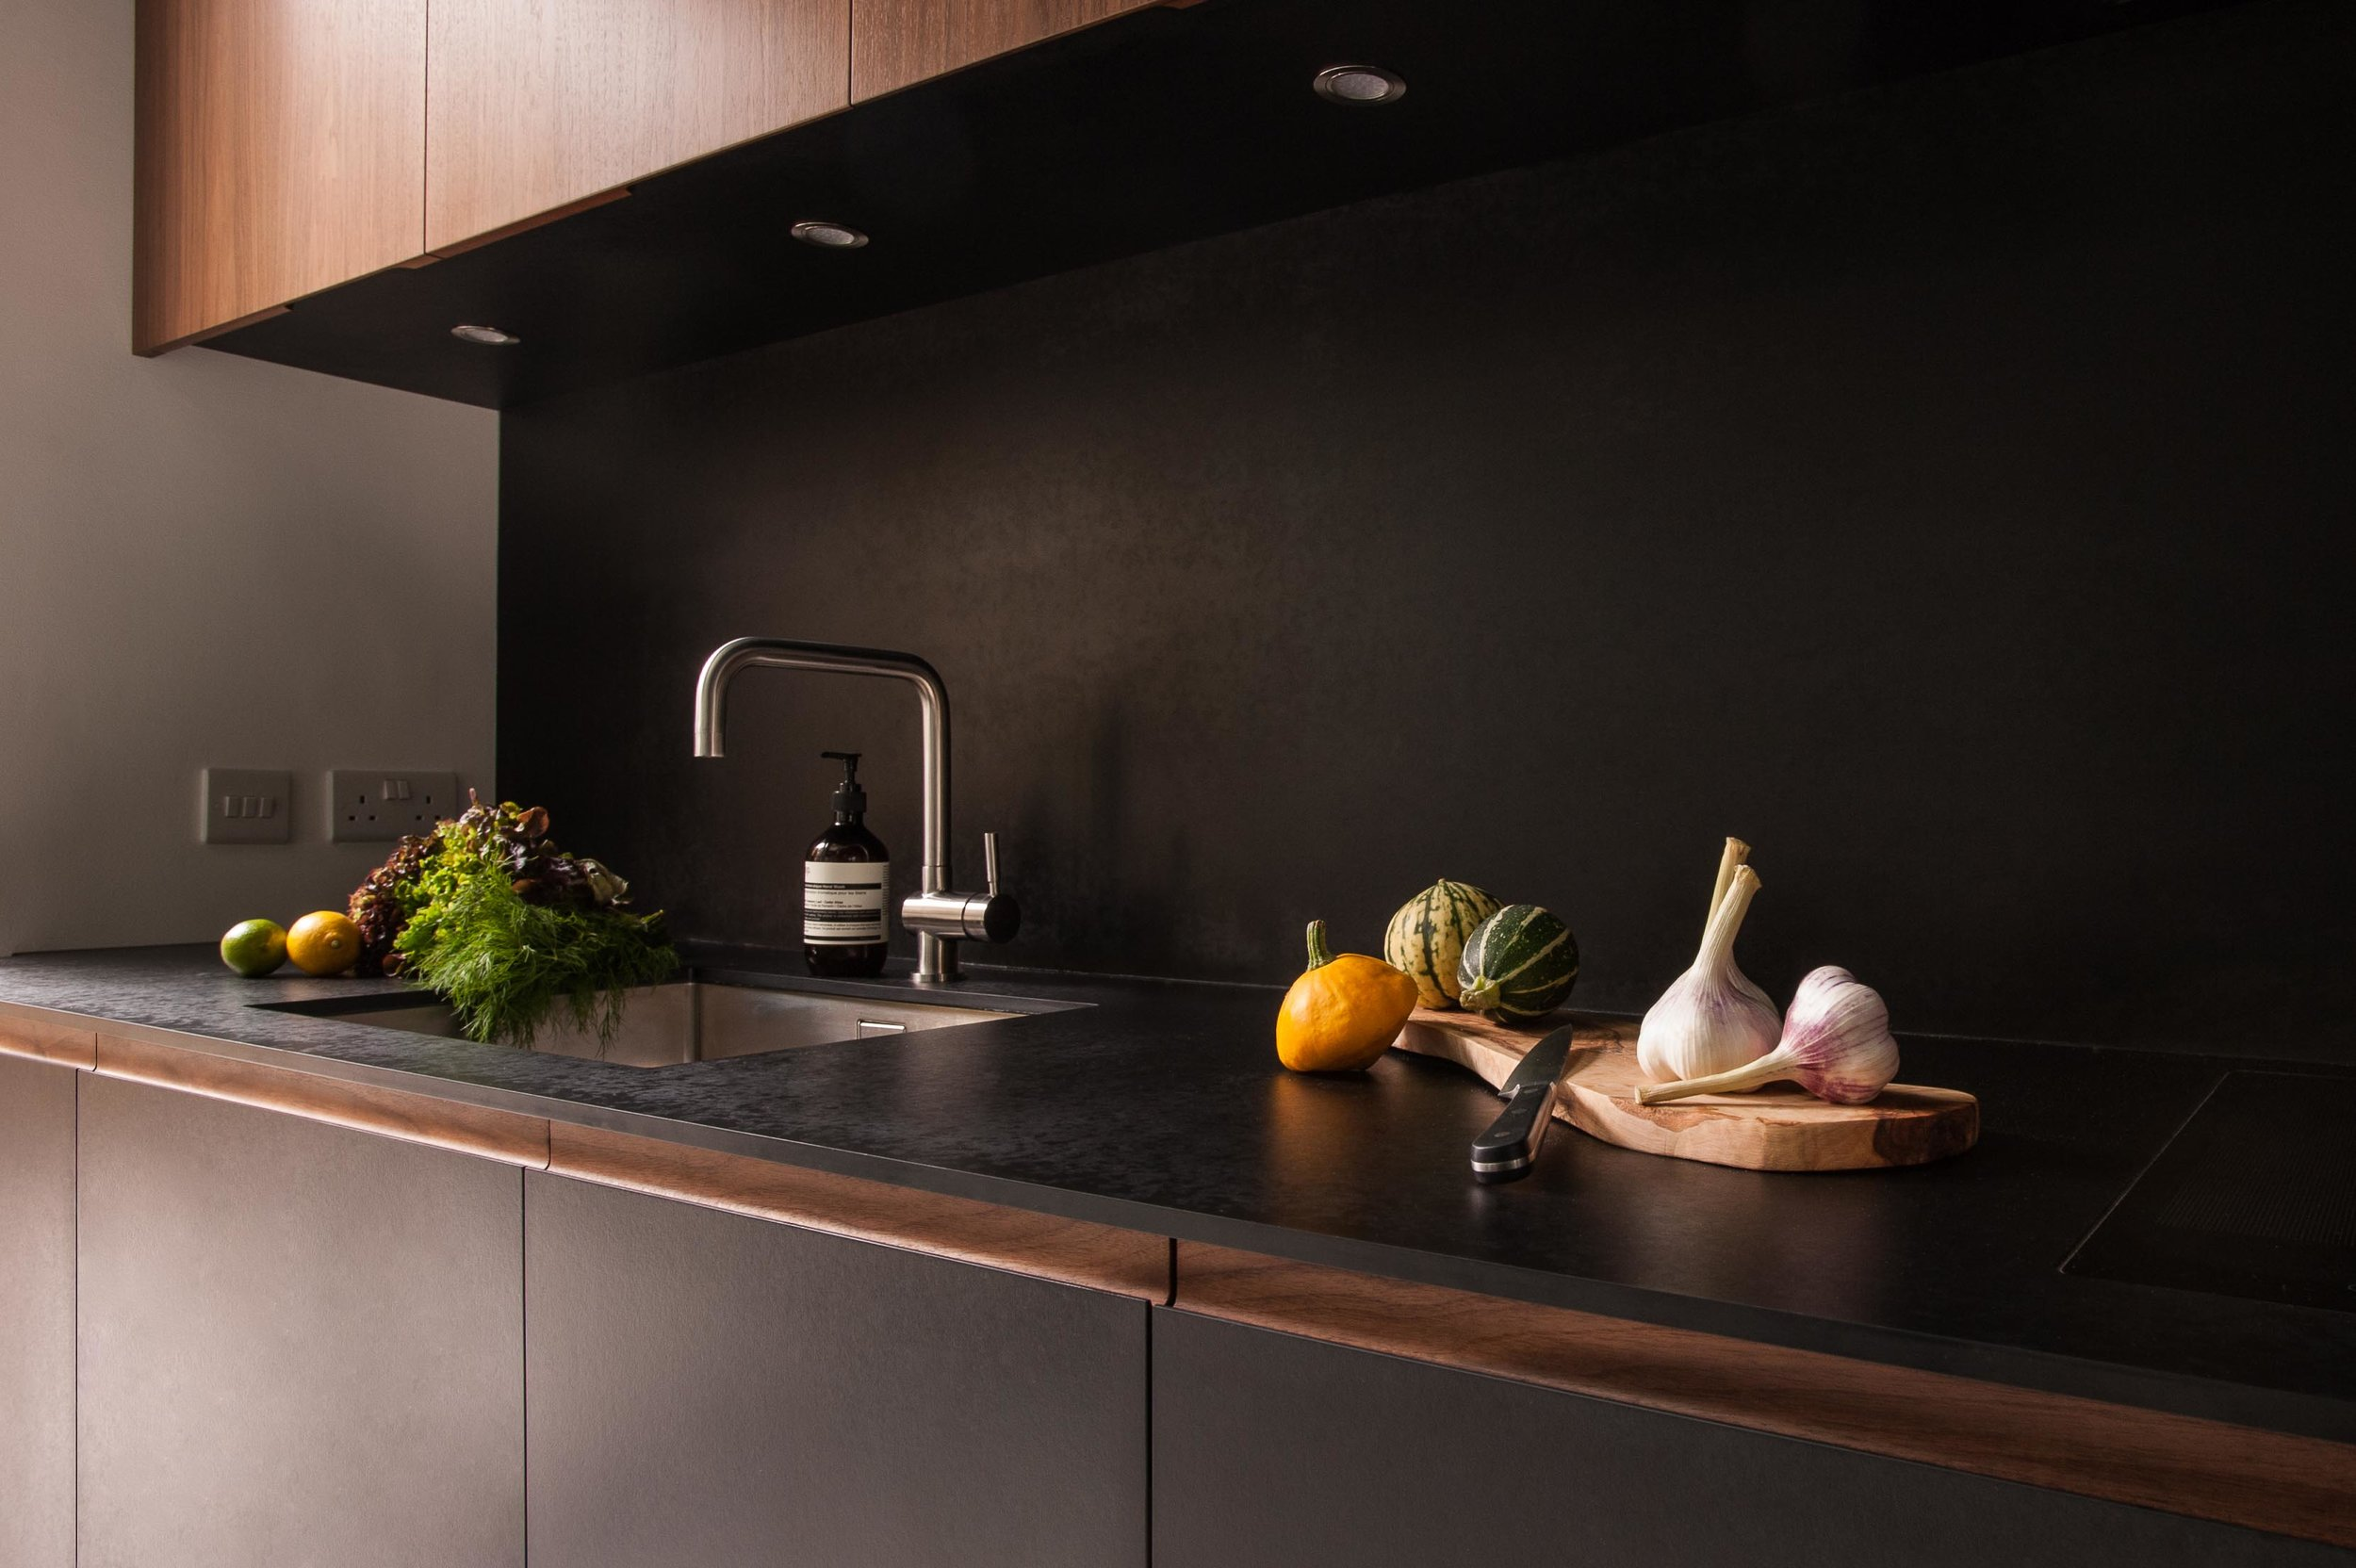 JT new Kitchen Edits SM1 (7 of 28).jpg